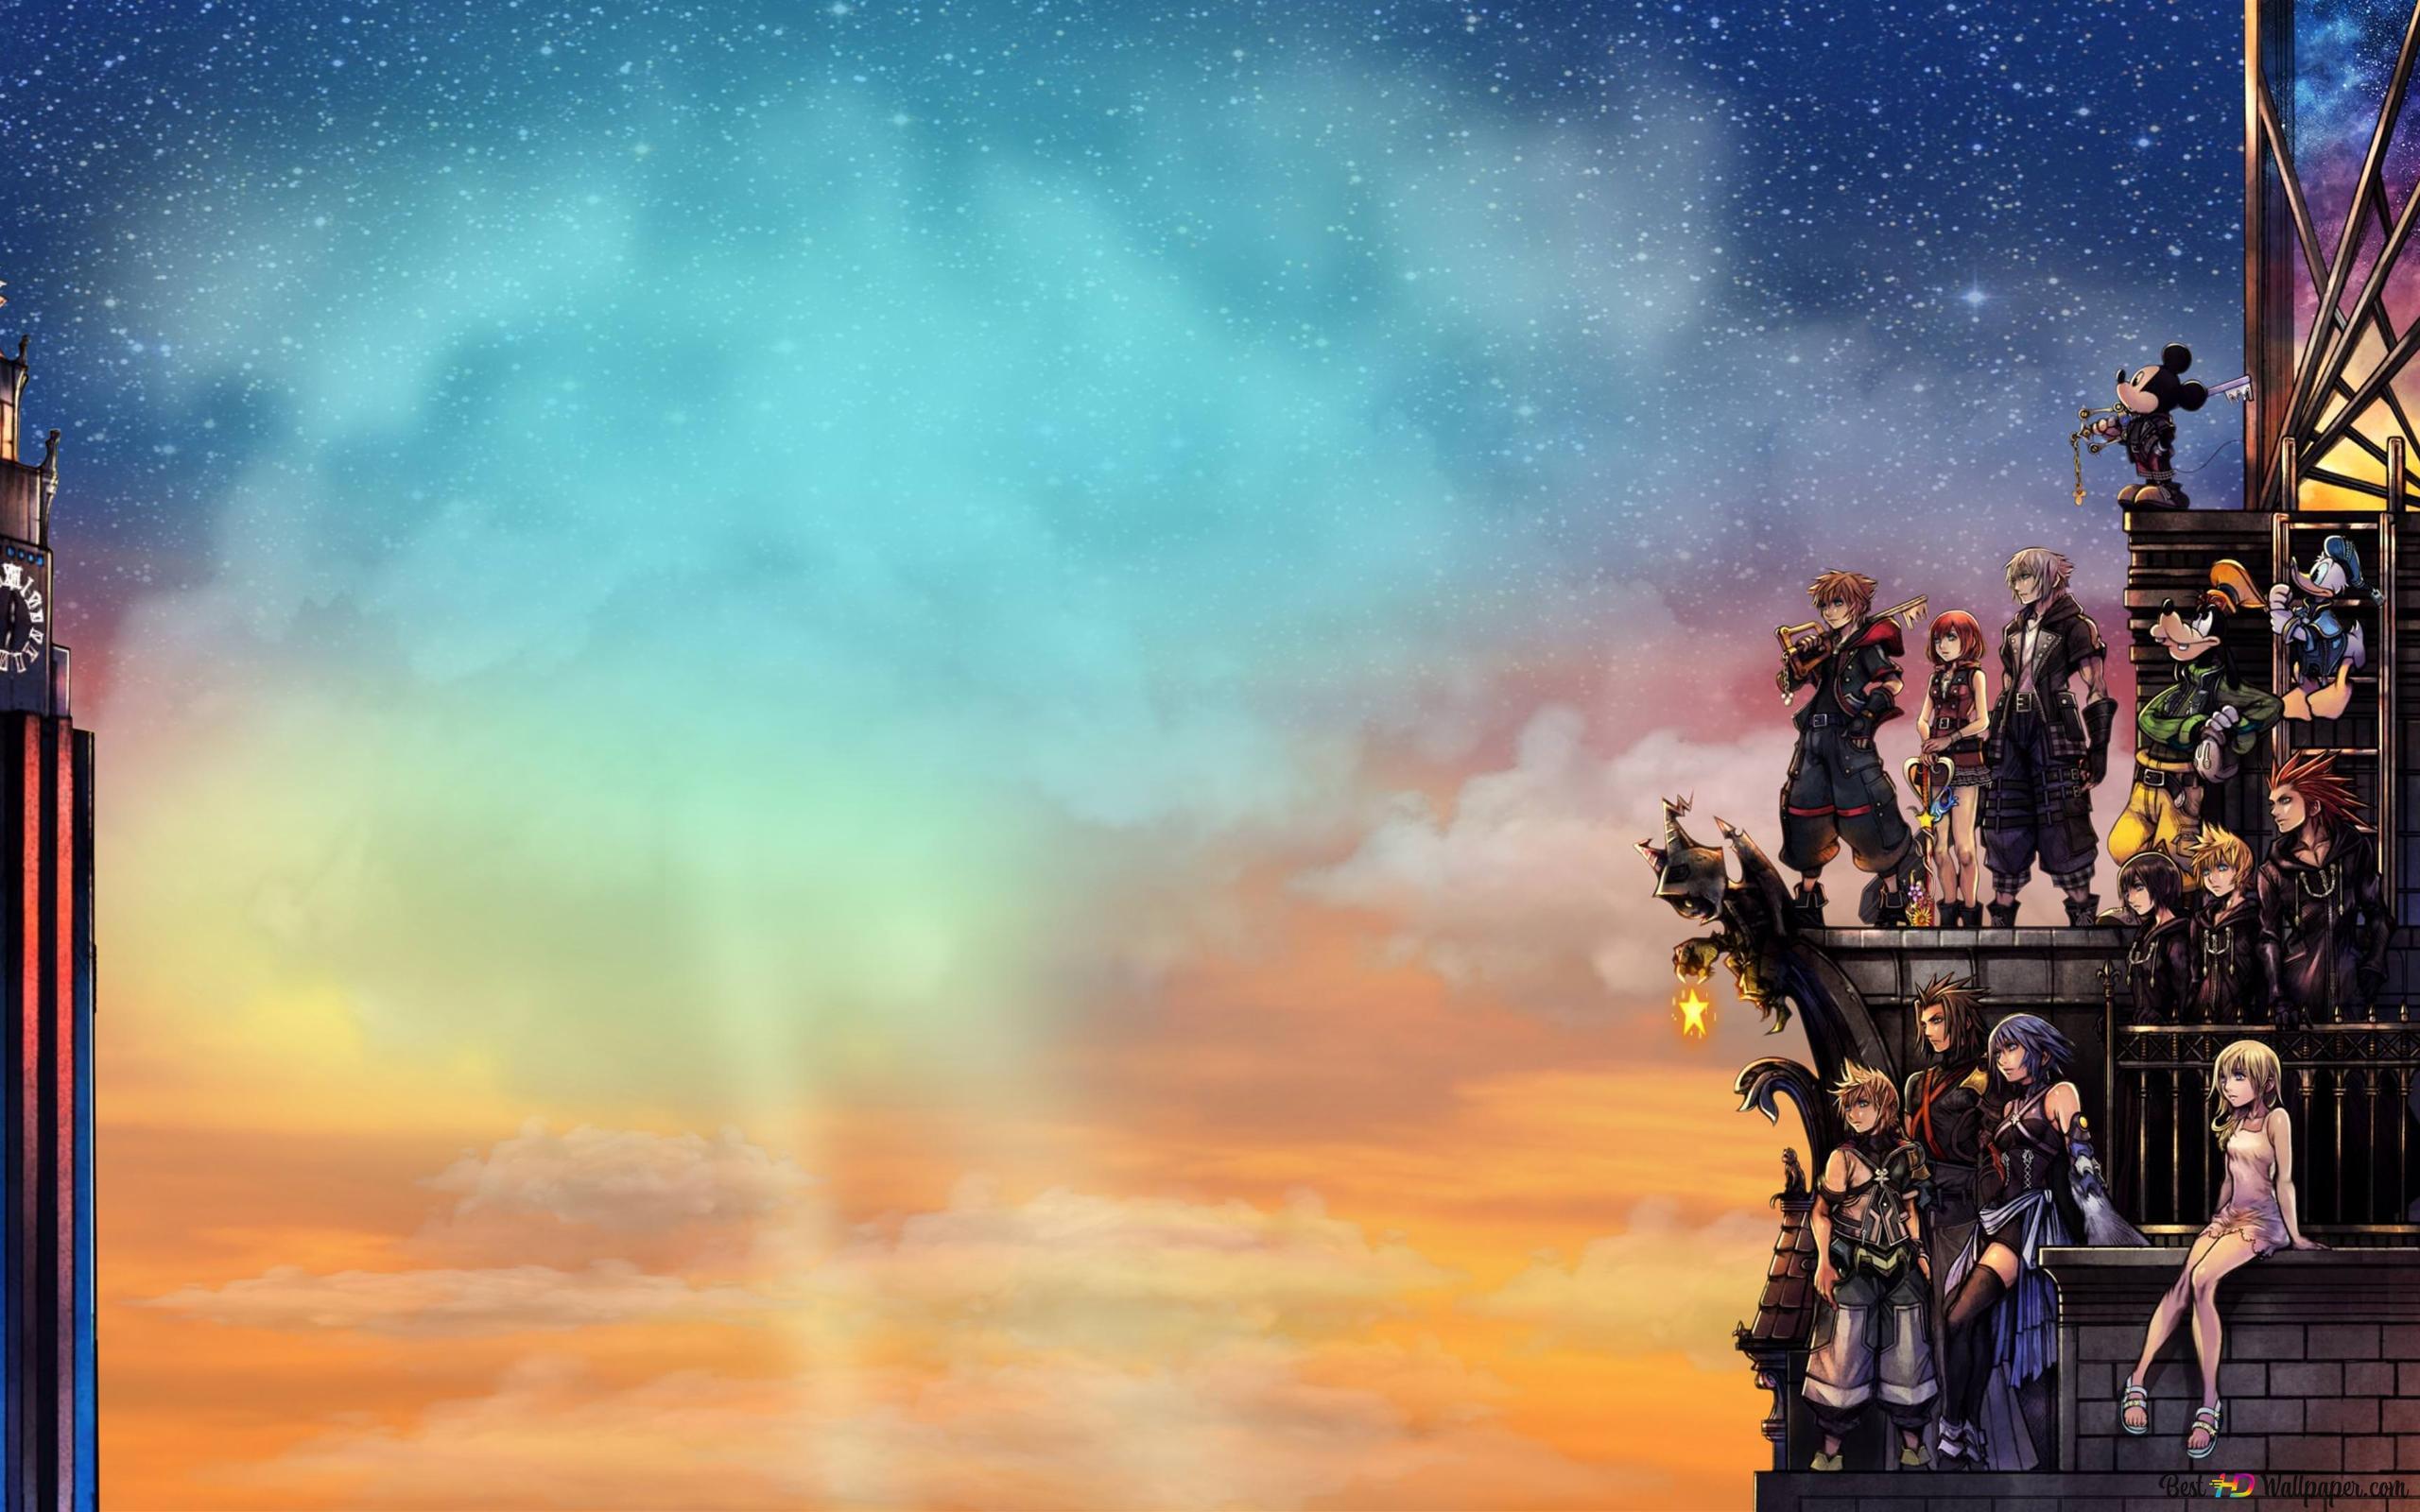 Kingdom Hearts Iii Hd Wallpaper Download